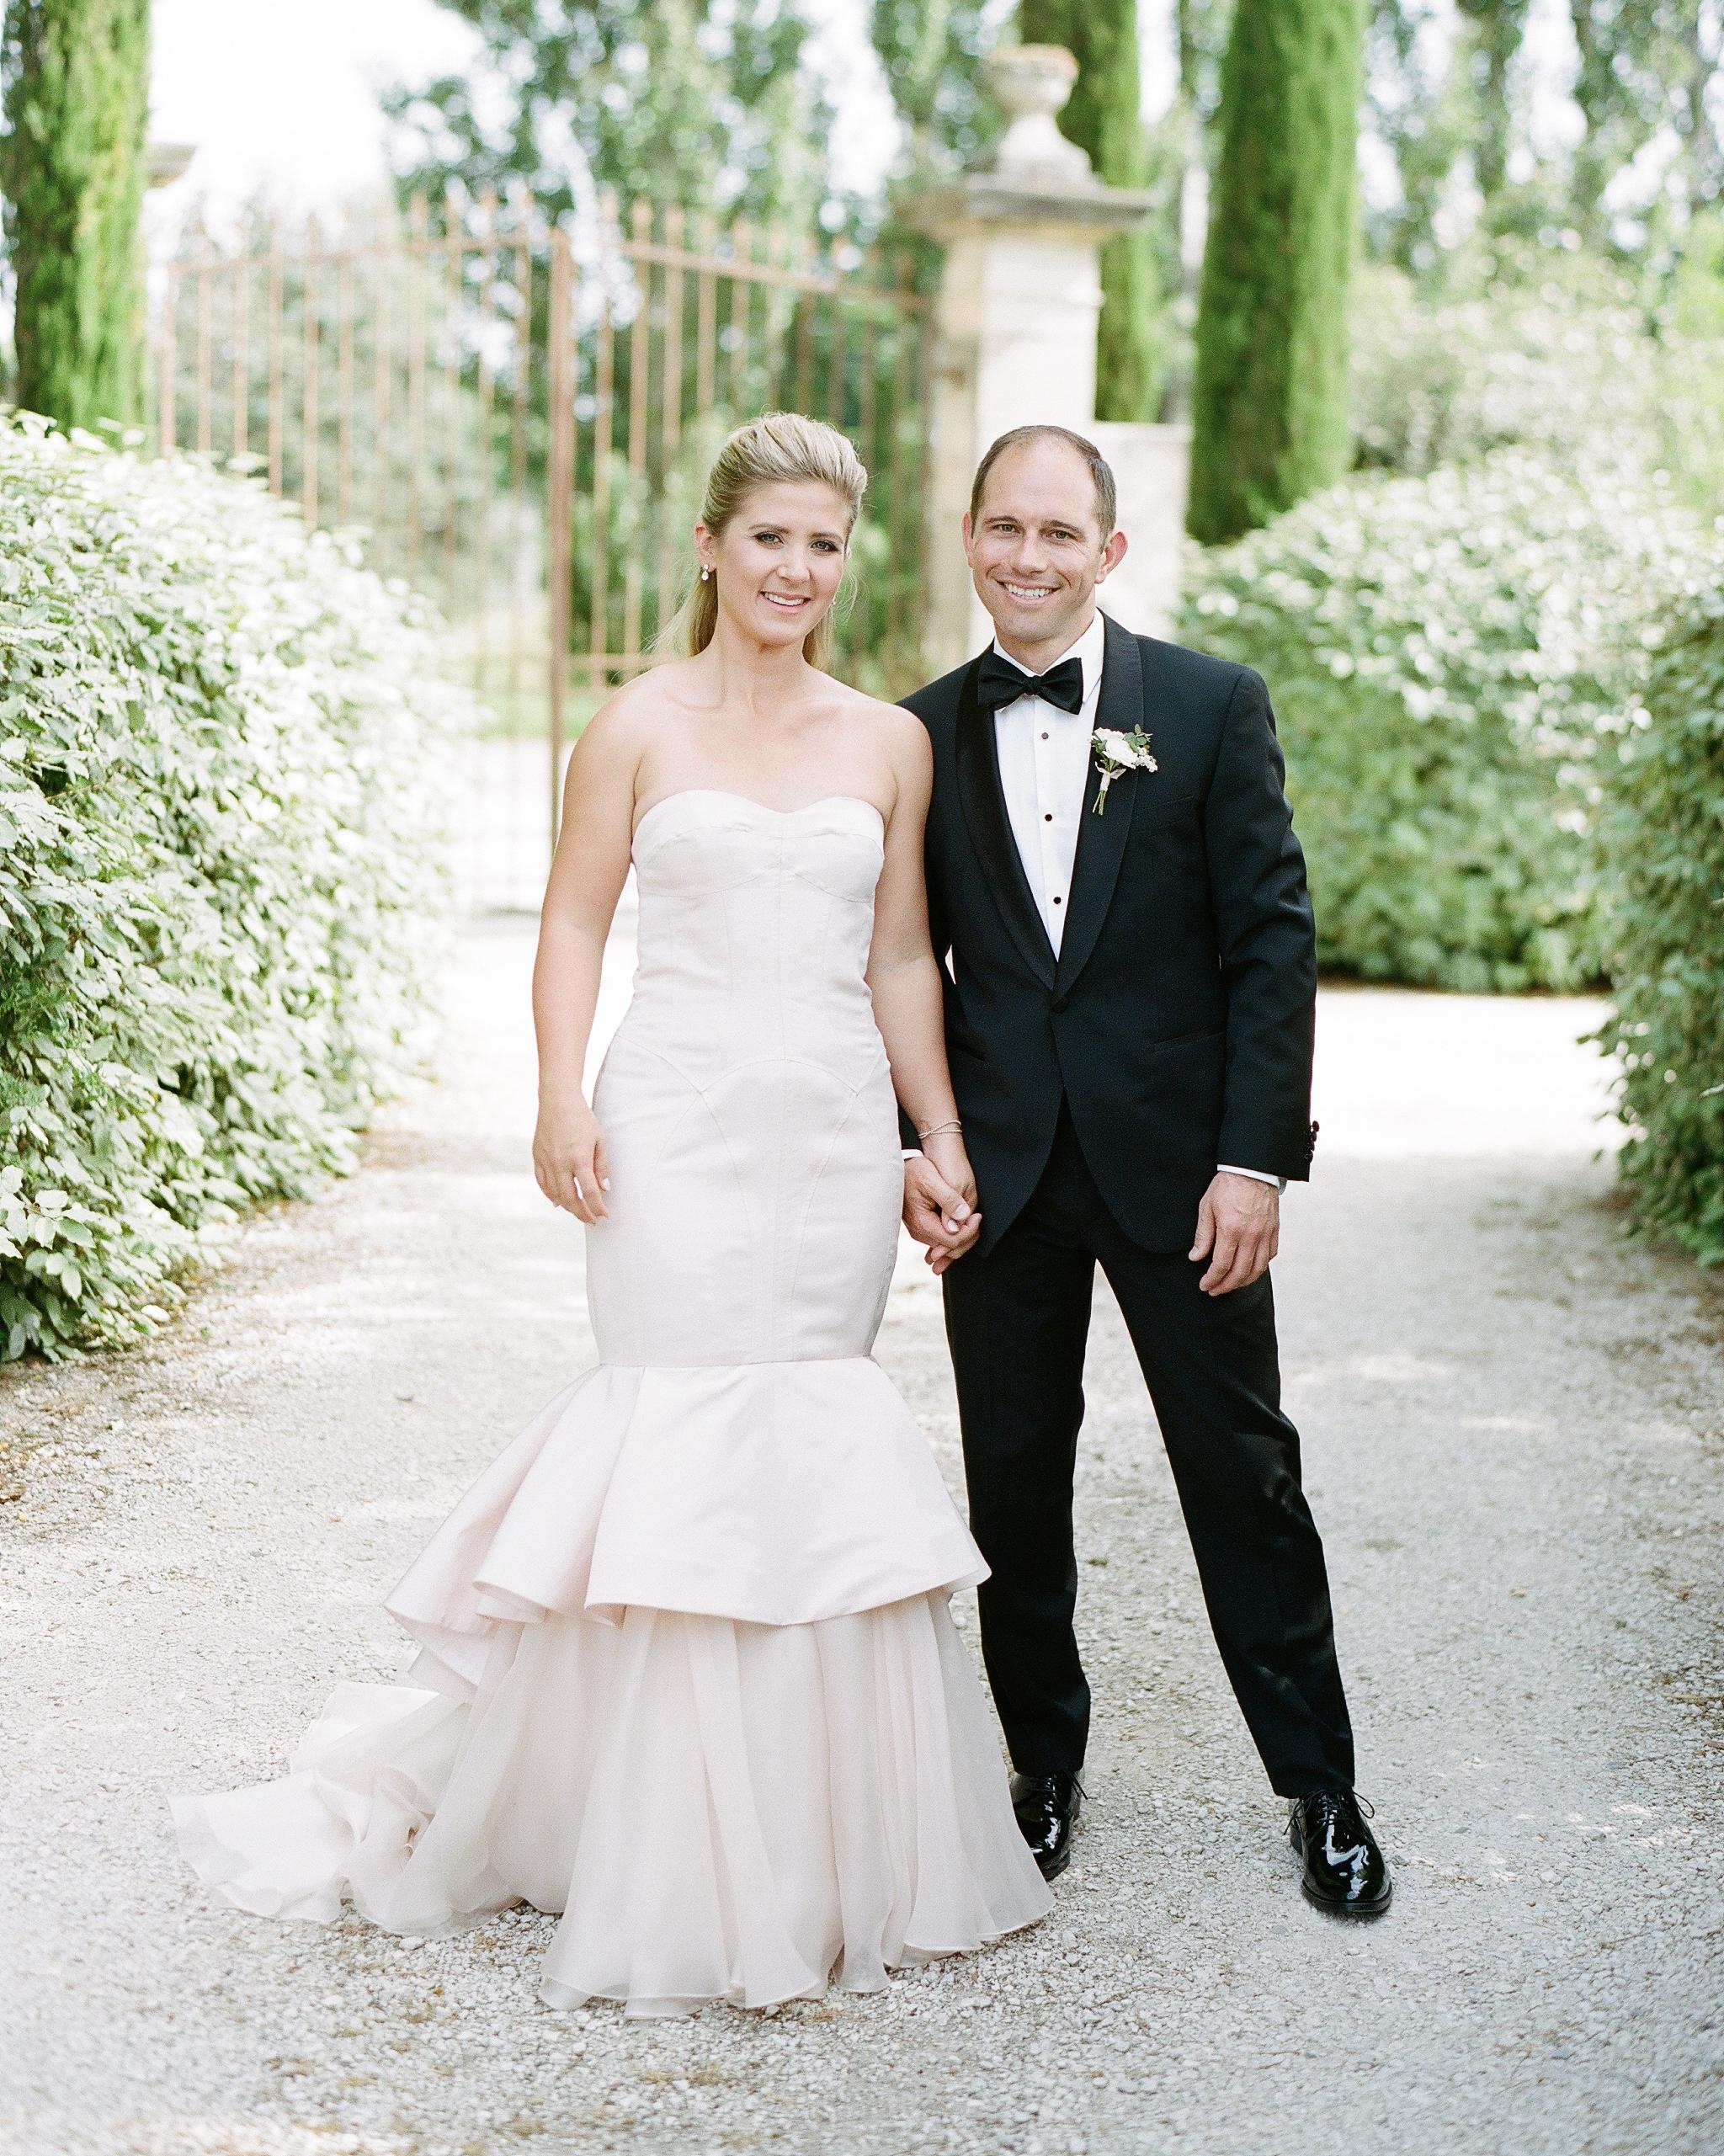 julie-chris-wedding-couple-0736-s12649-0216.jpg